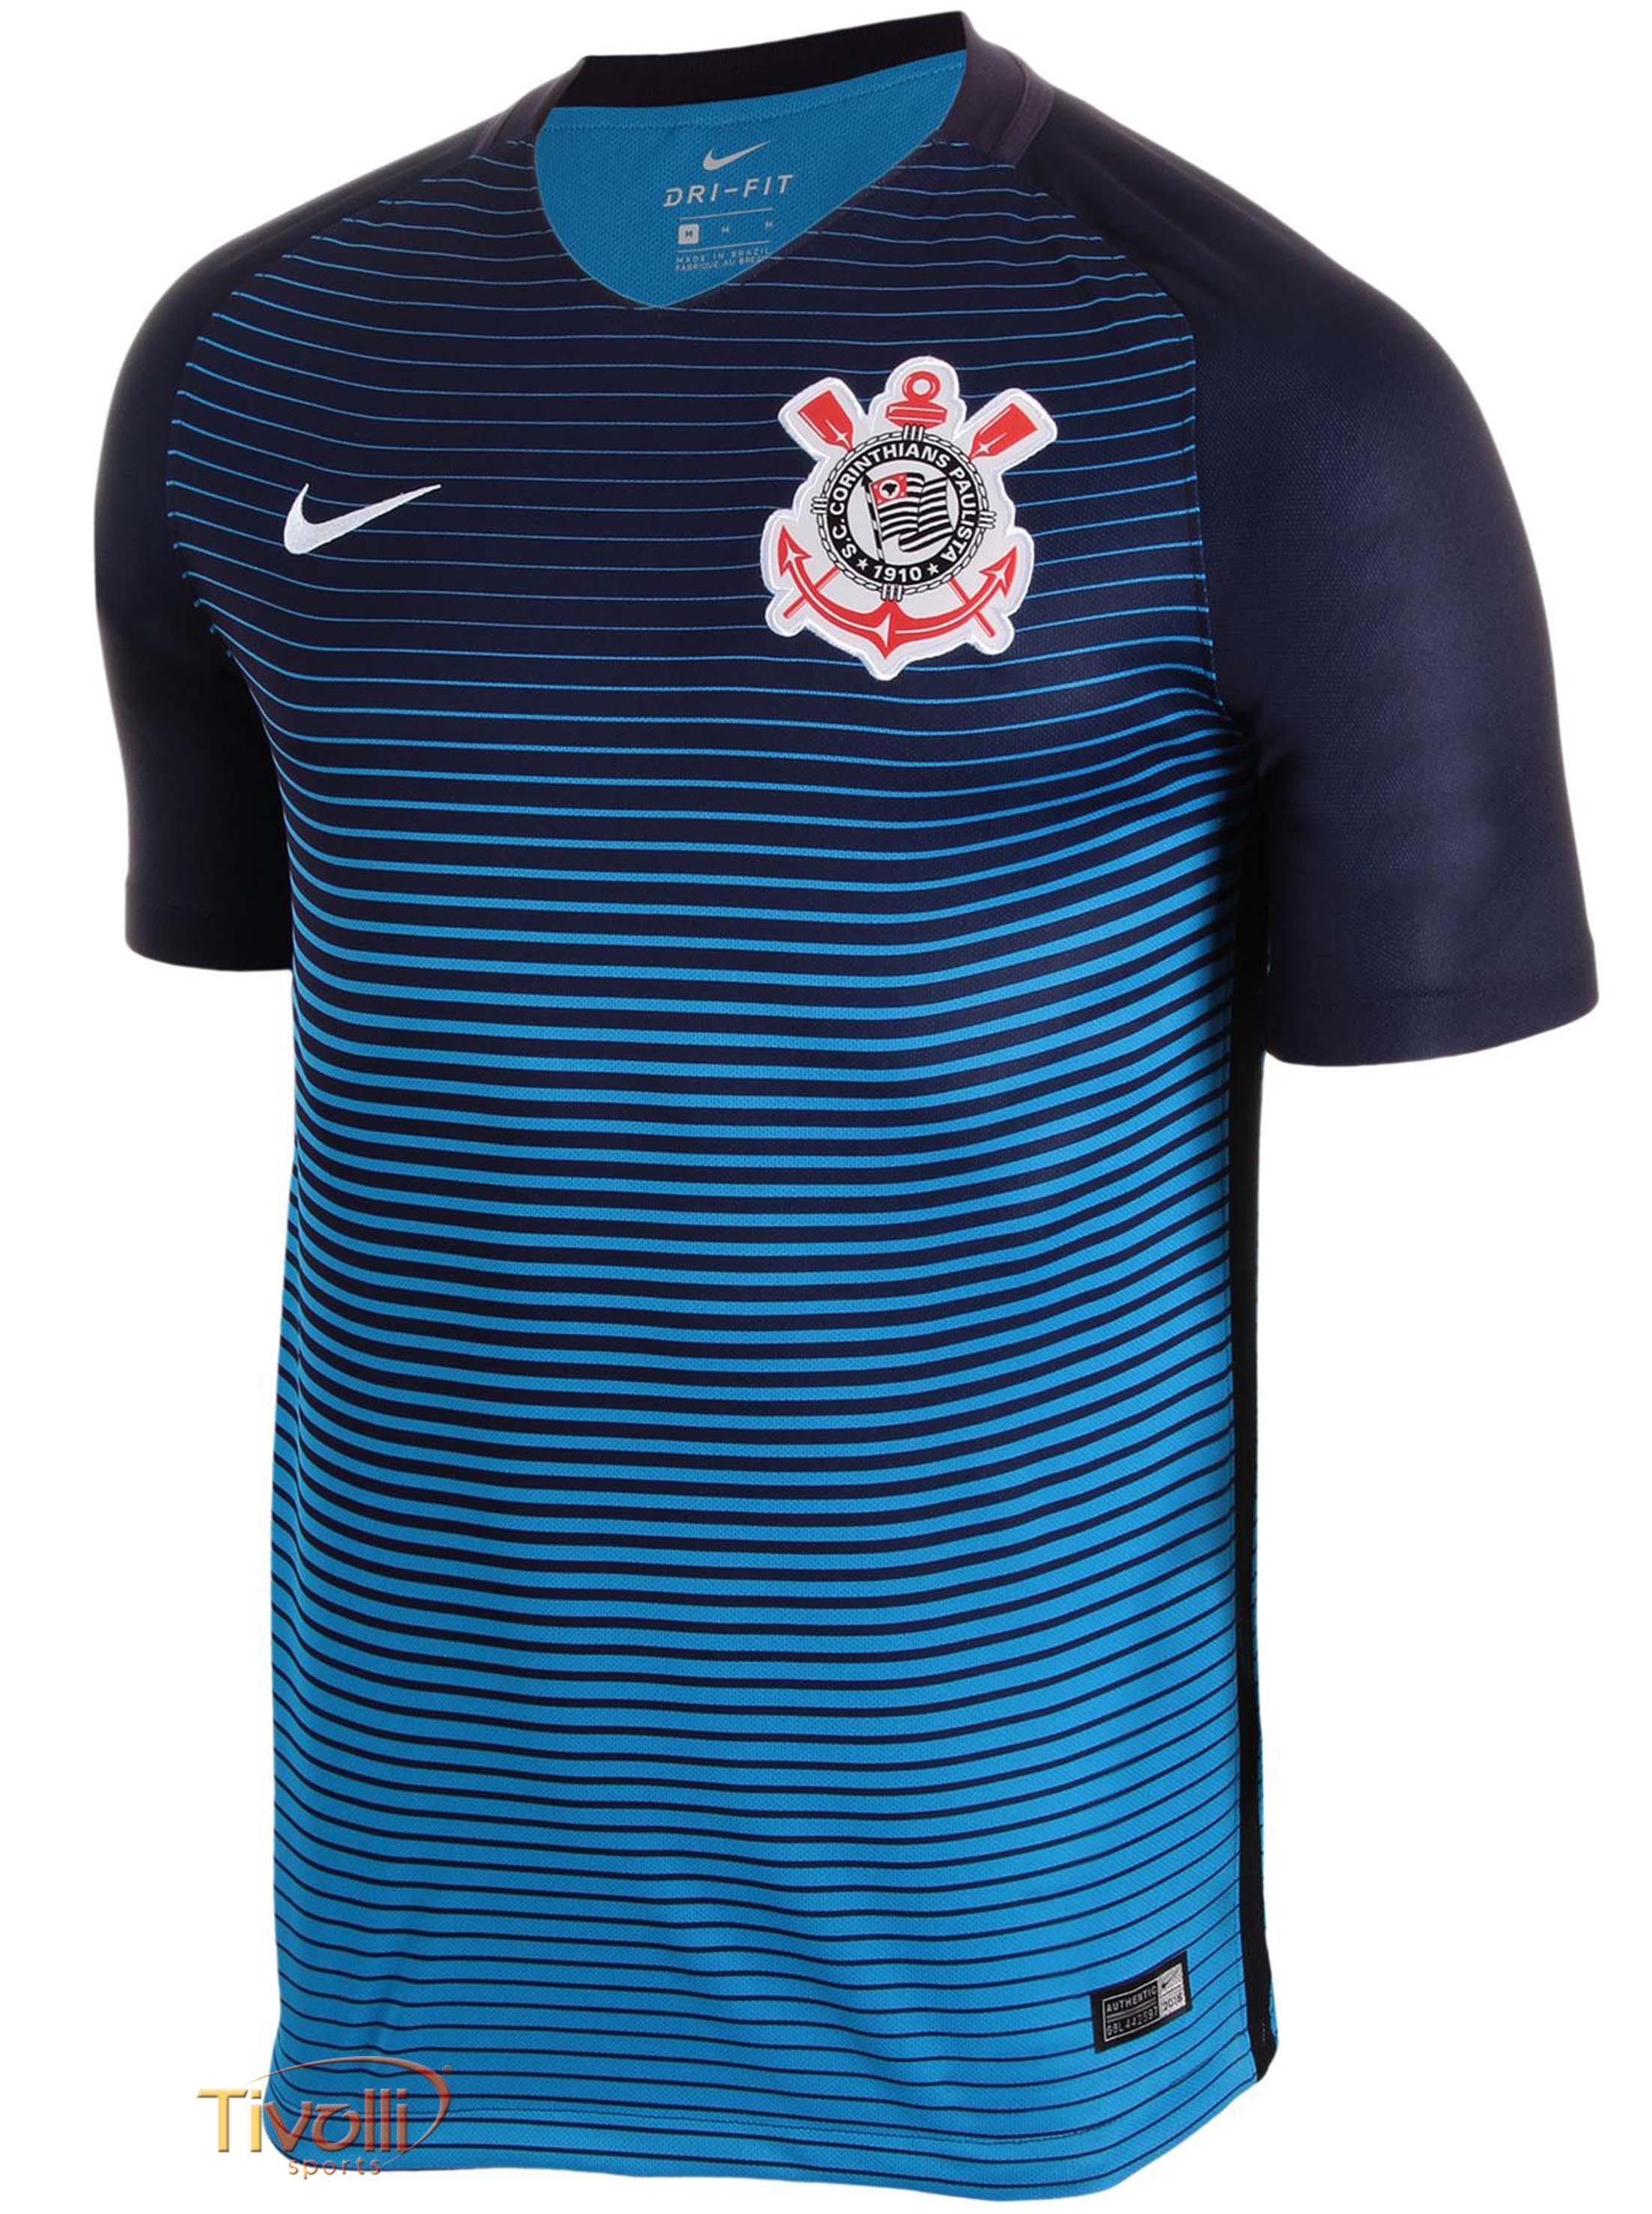 Camiseta Nike Corinthians III 2016 2017 Torcedor Masculina   Azul   51e2d78068a80